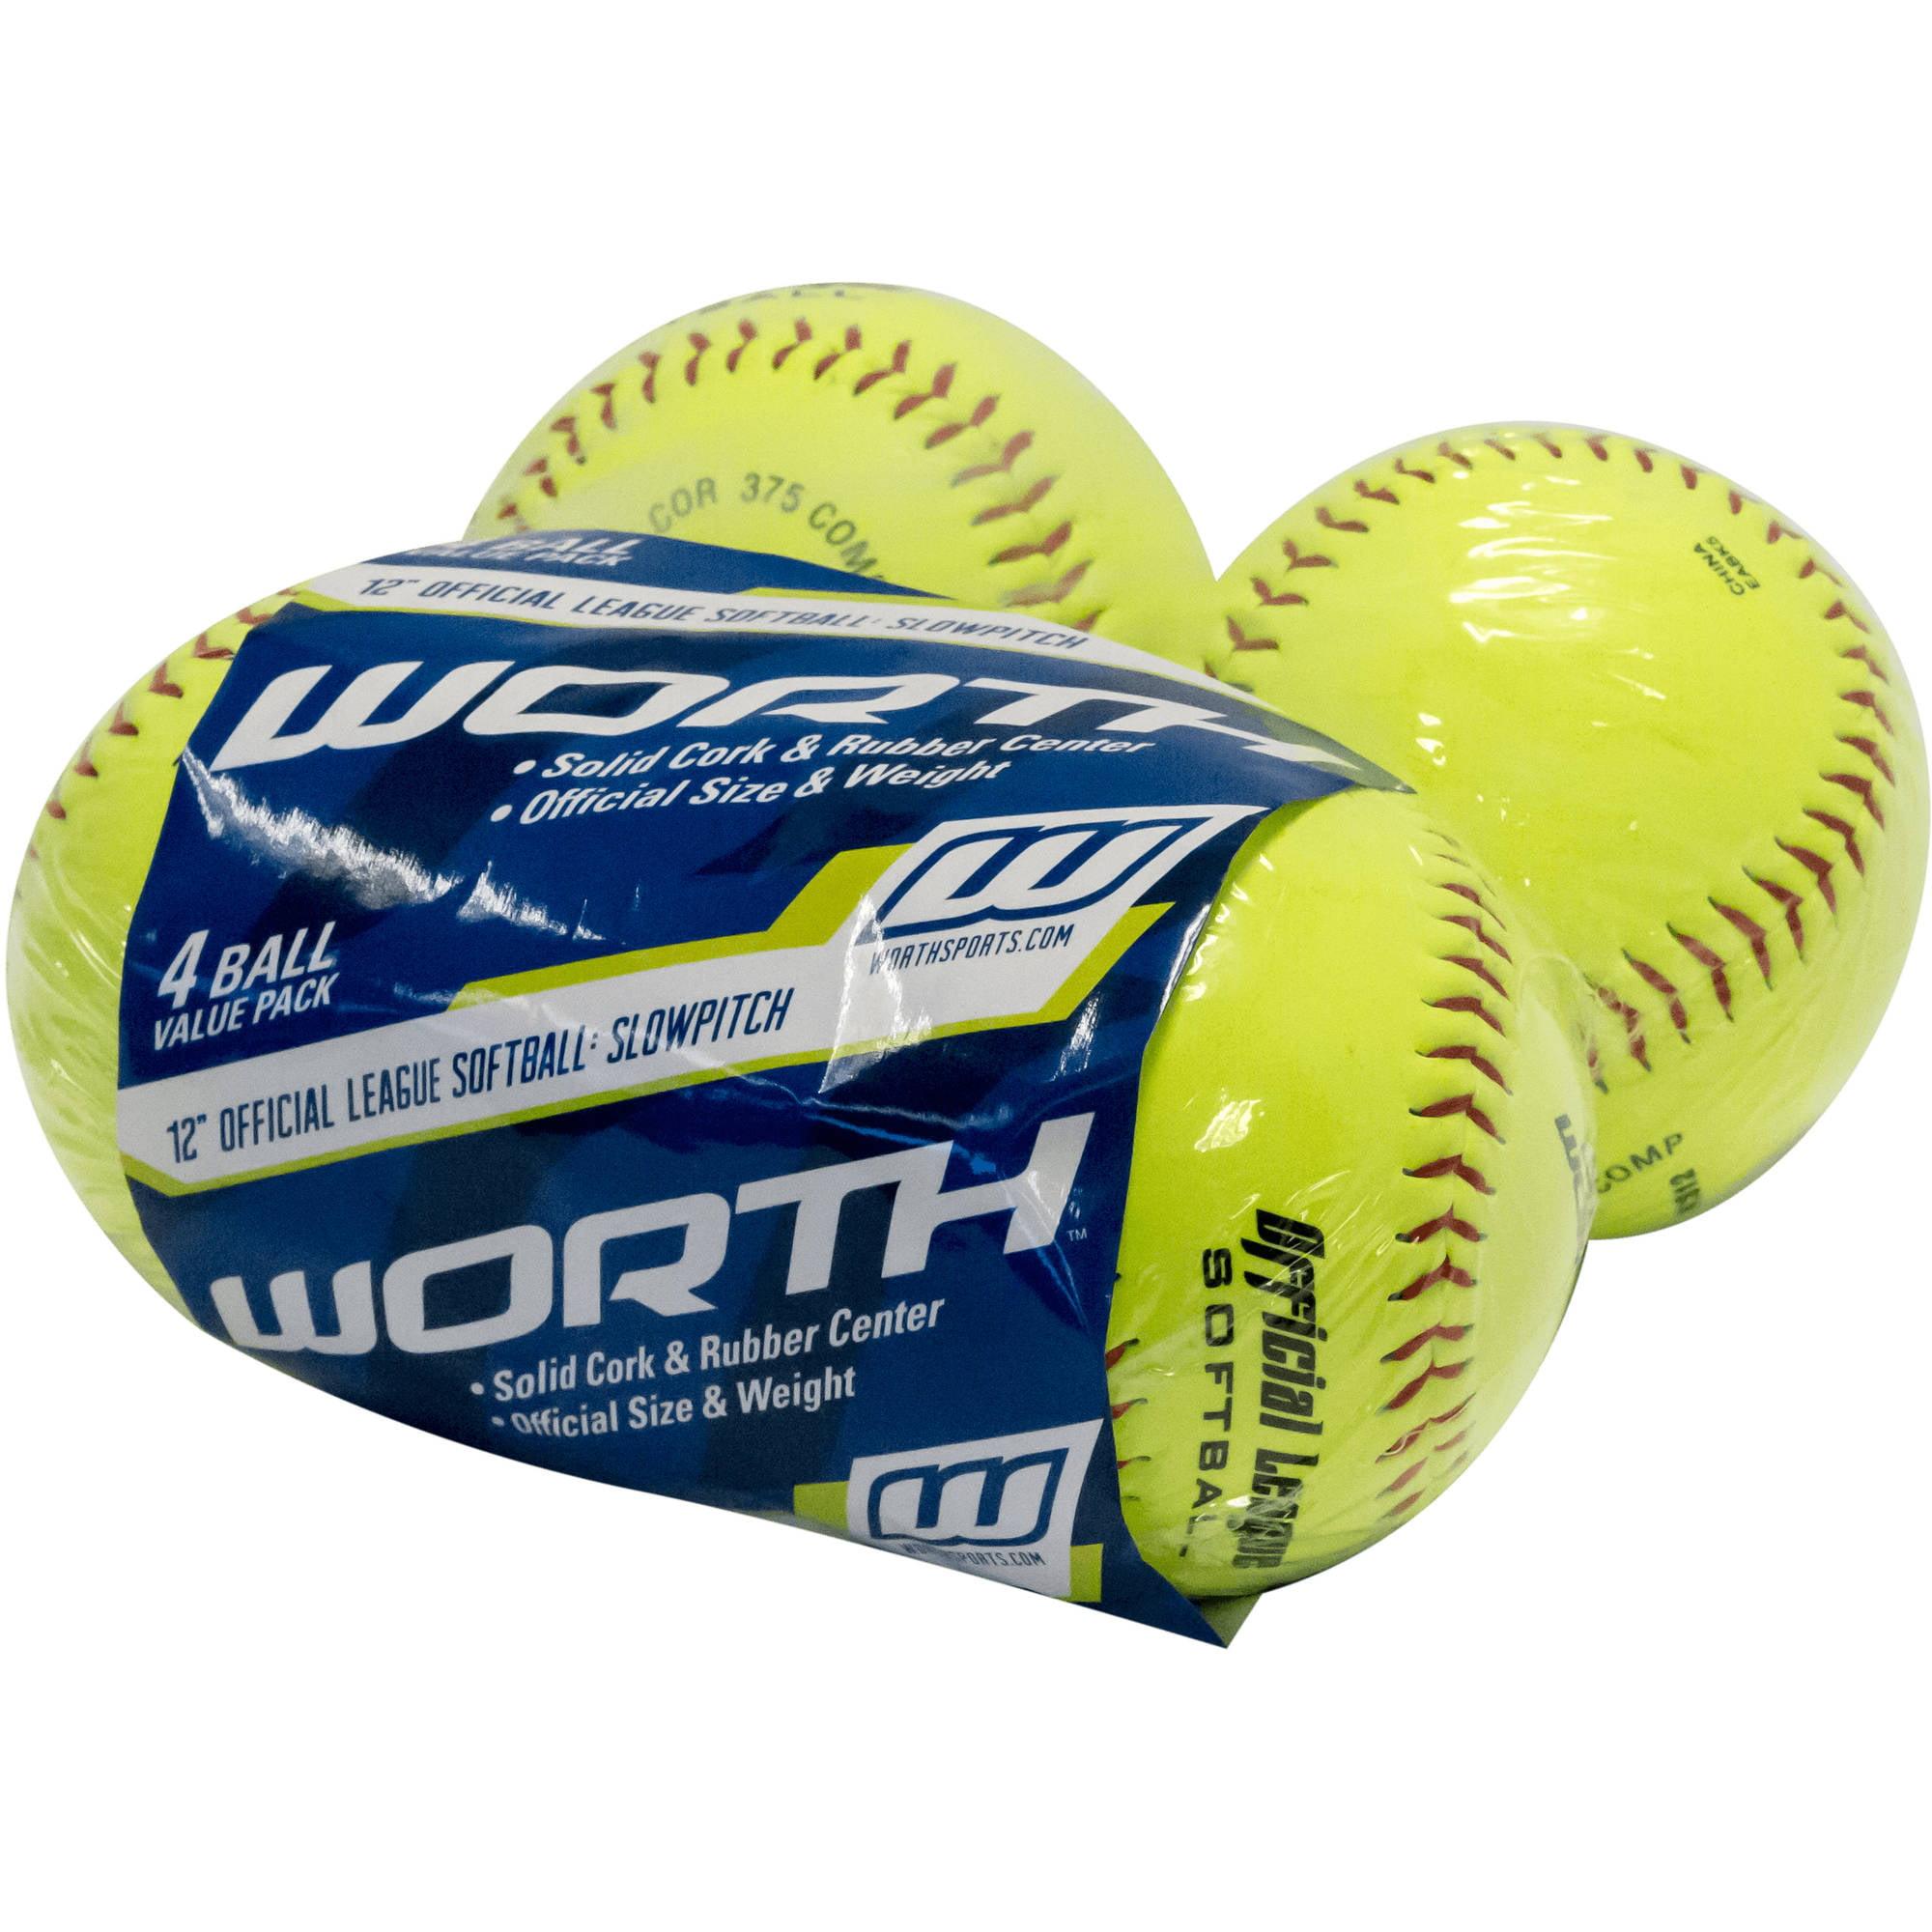 Easton Incrediball Softouch 10 Inch Yellow Training Balls